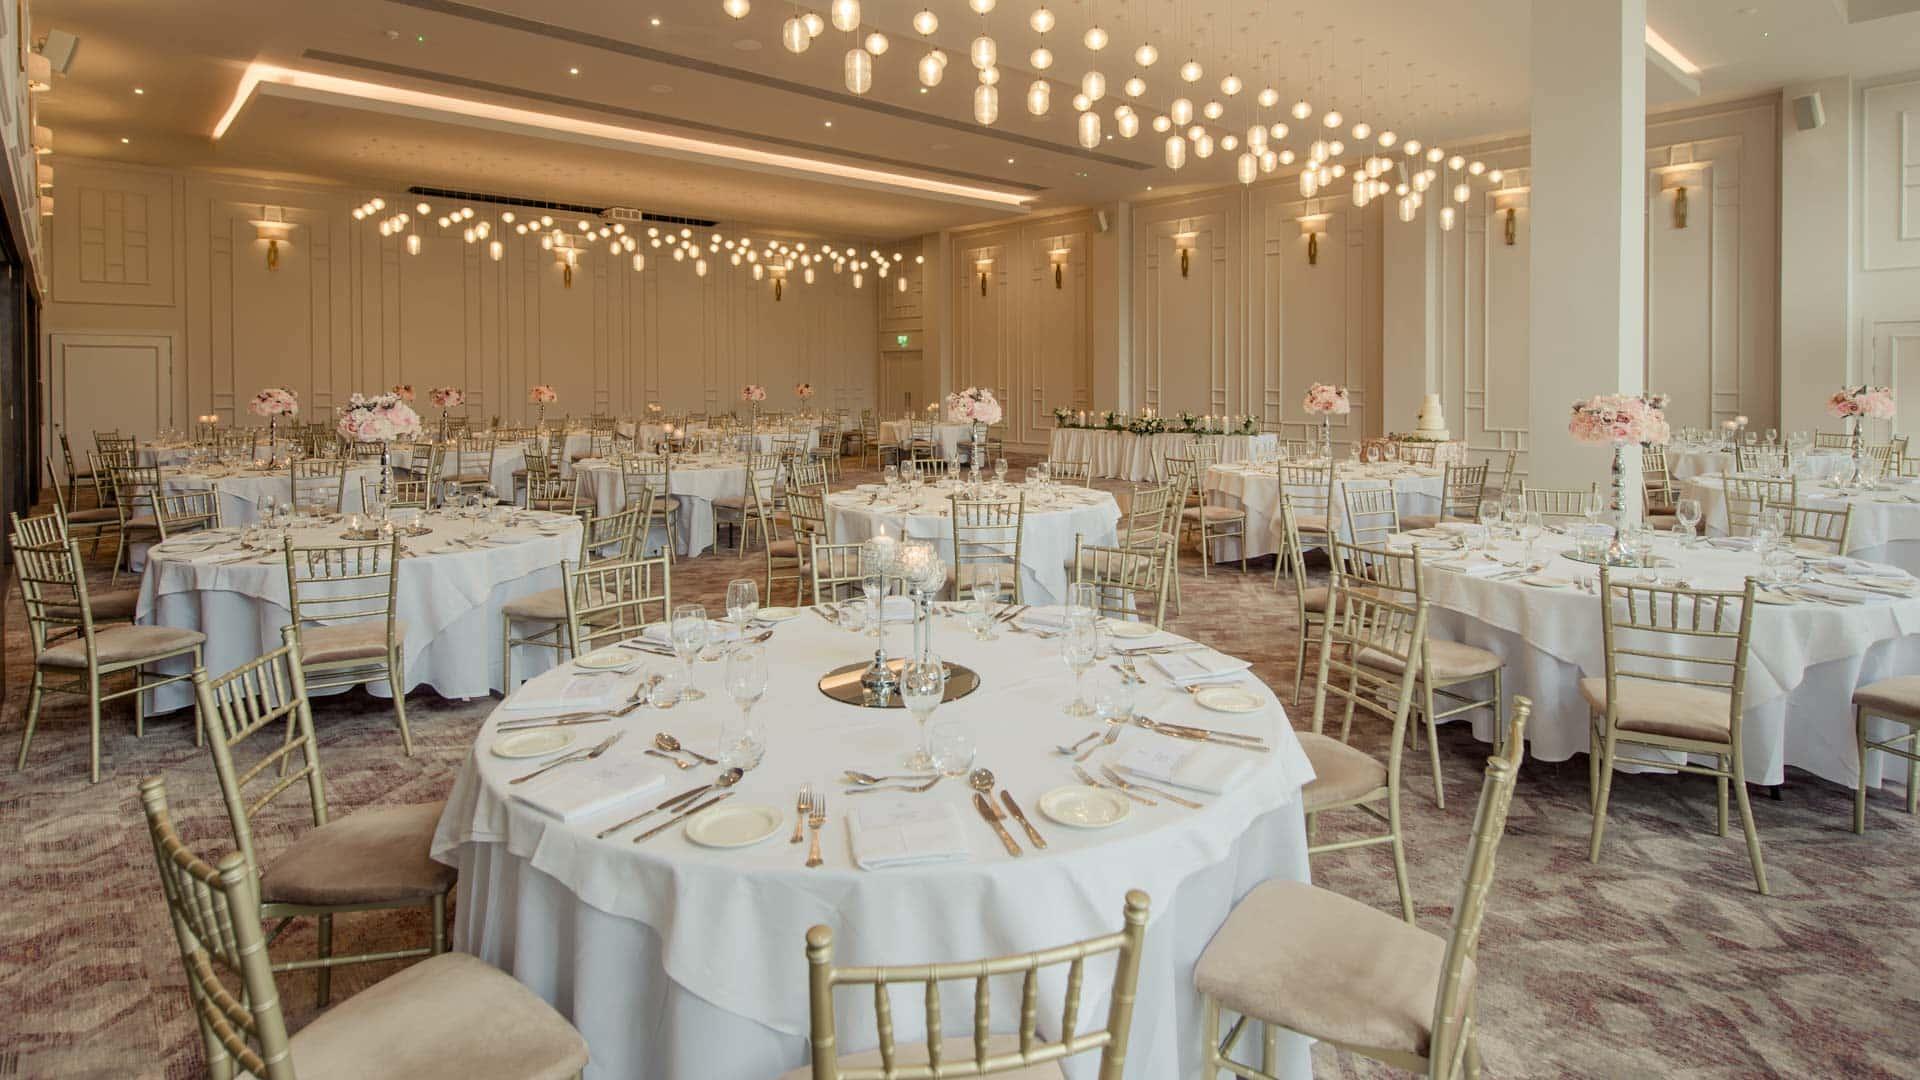 Osprey Hotel unveils new Ballroom